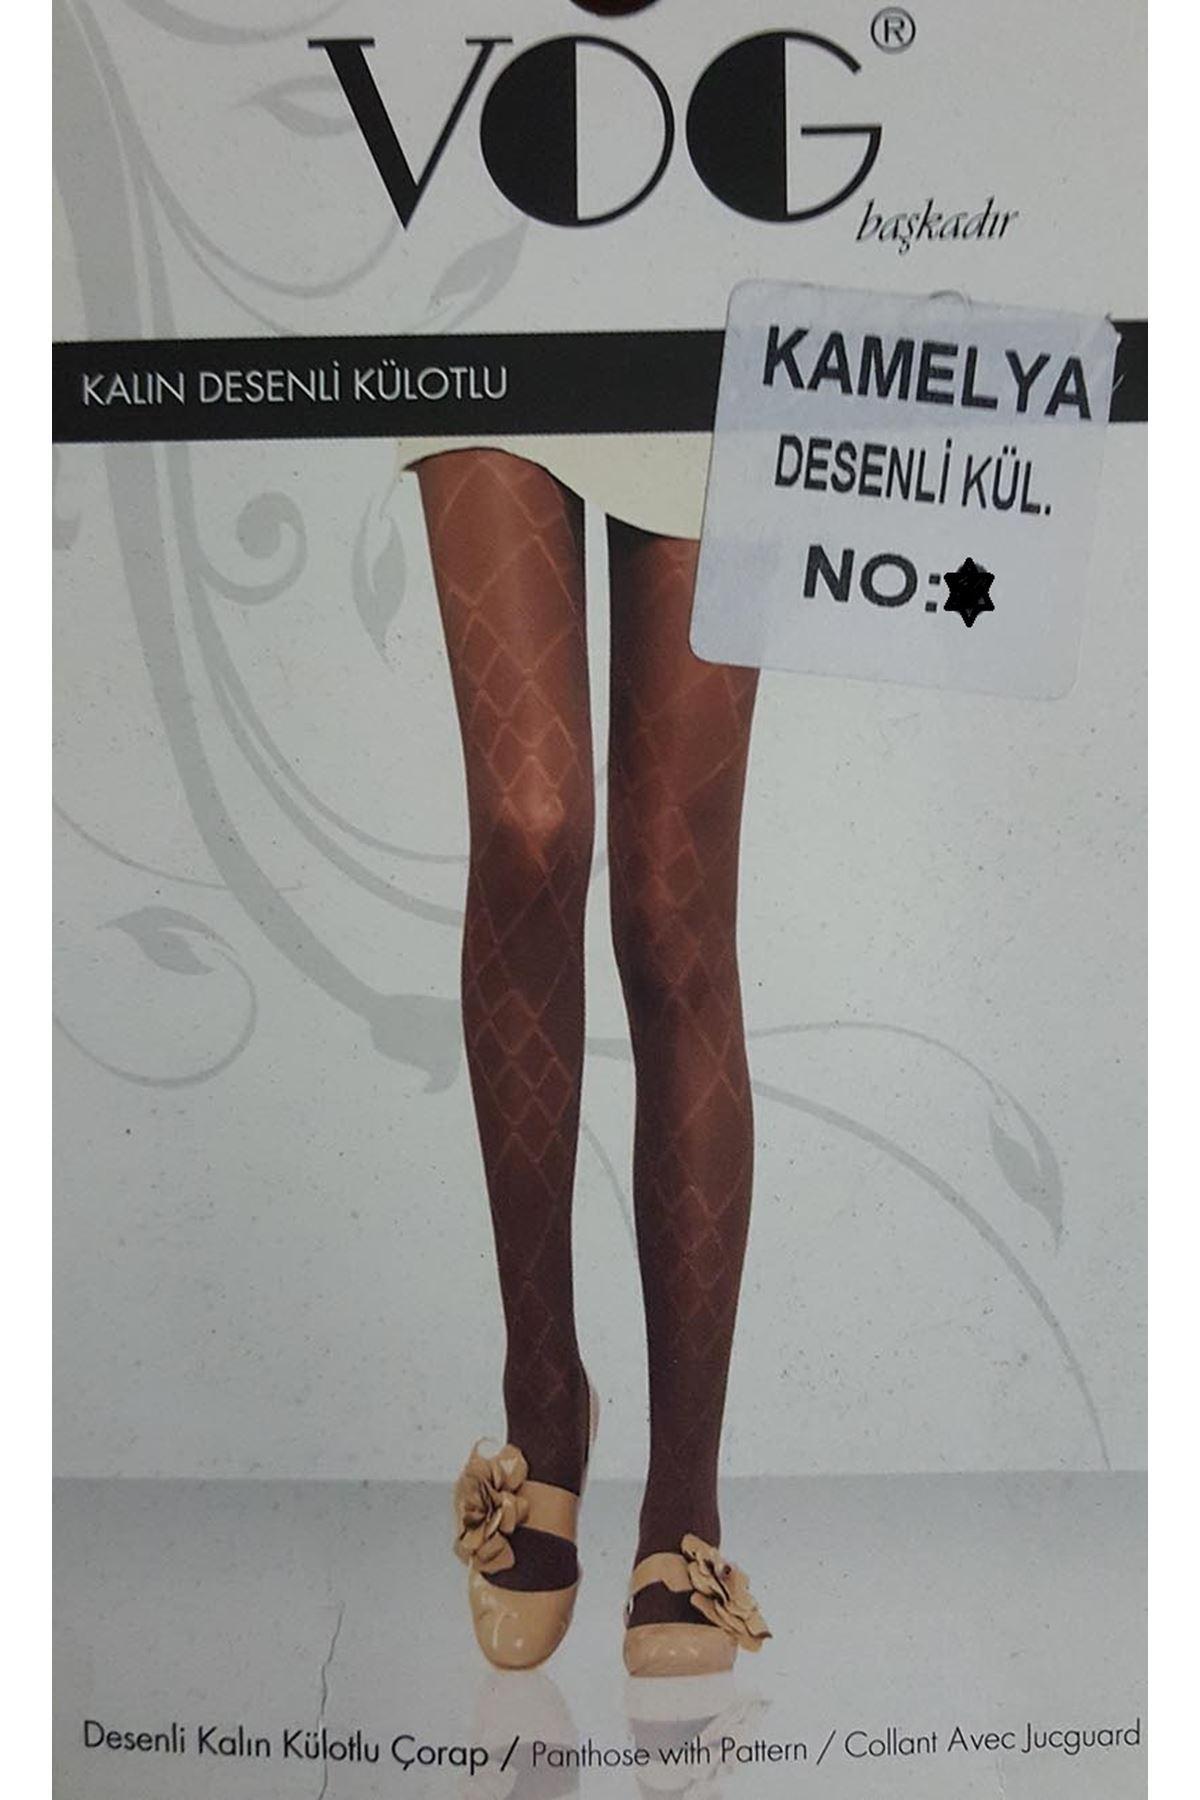 VOG Külotlu Çorap Kahverengi 18A-723K